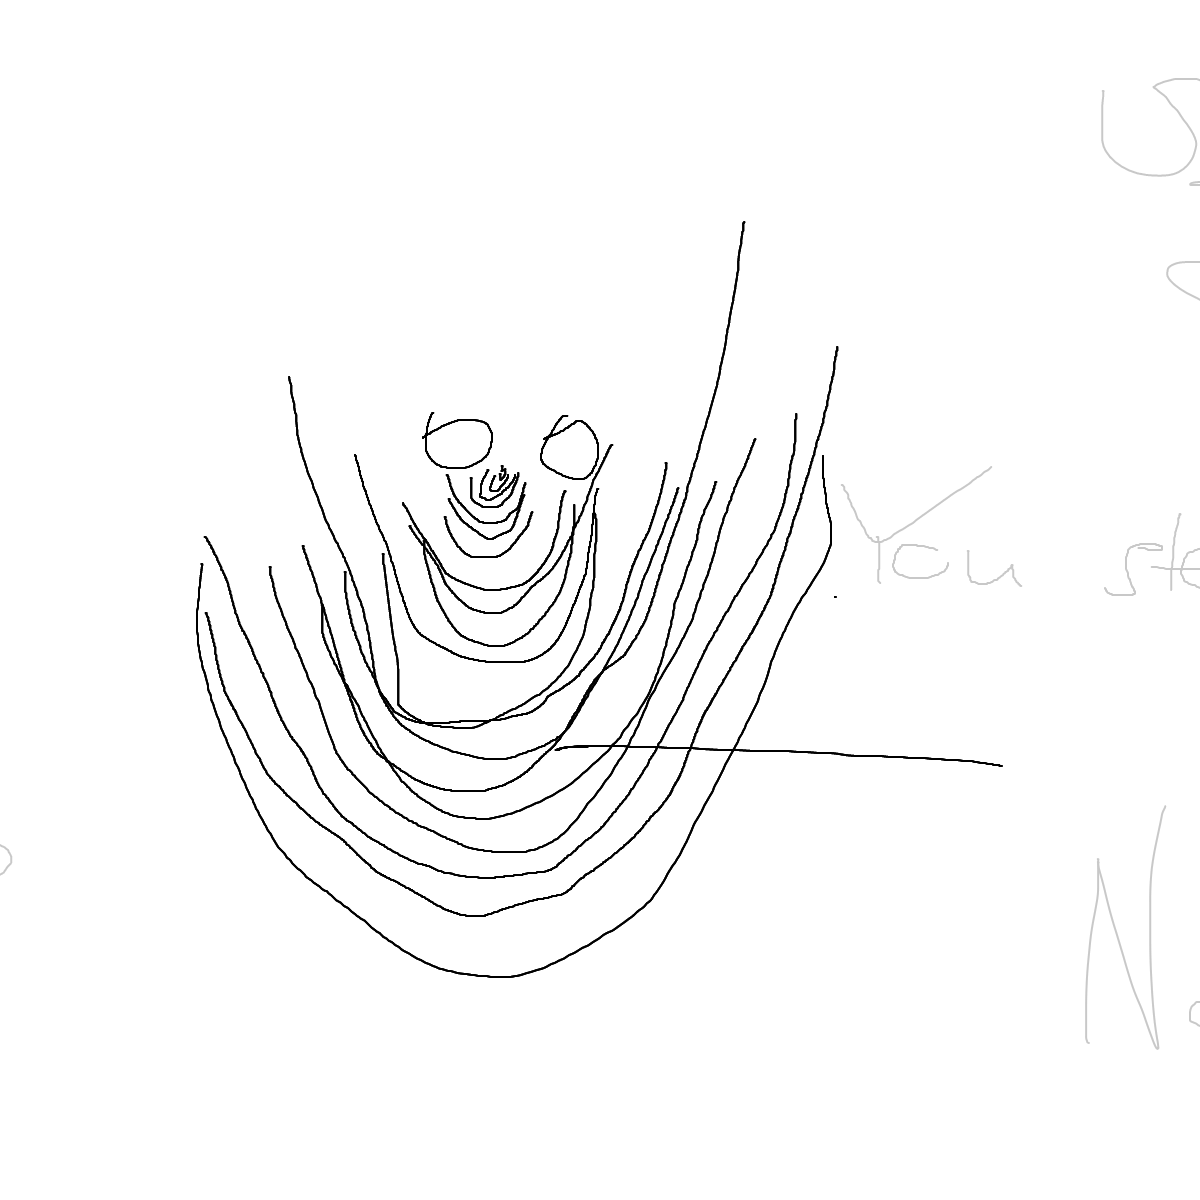 BAAAM drawing#13000 lat:30.2886581420898440lng: -97.7490234375000000